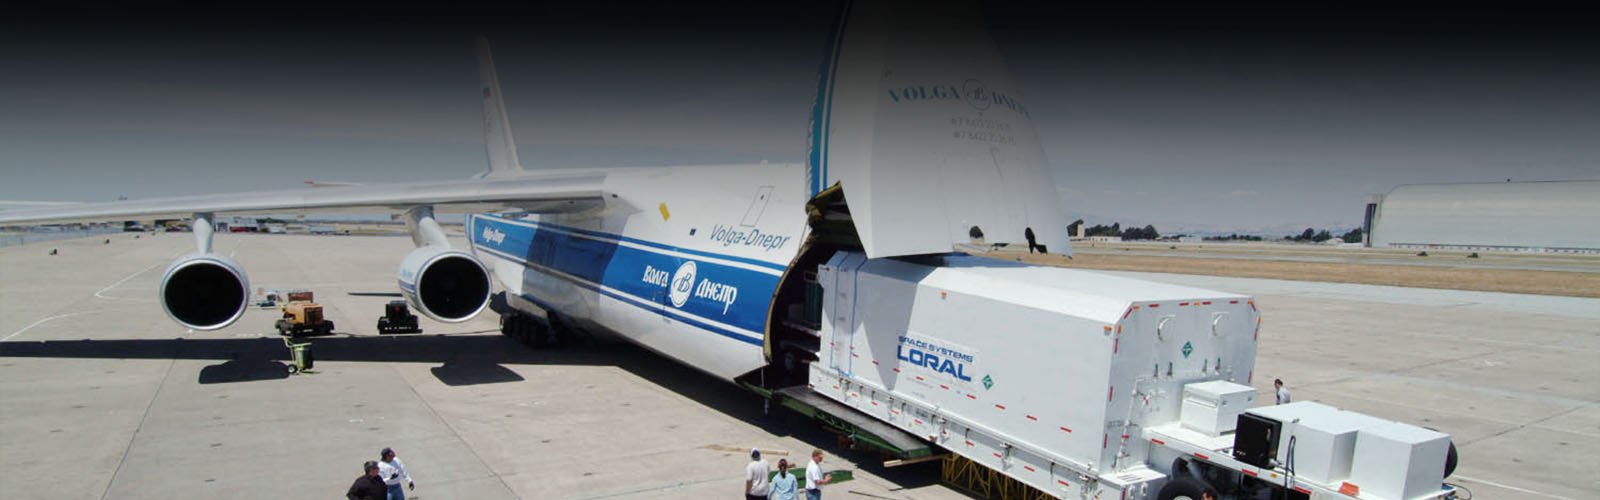 charter an airplane for cargo air business international